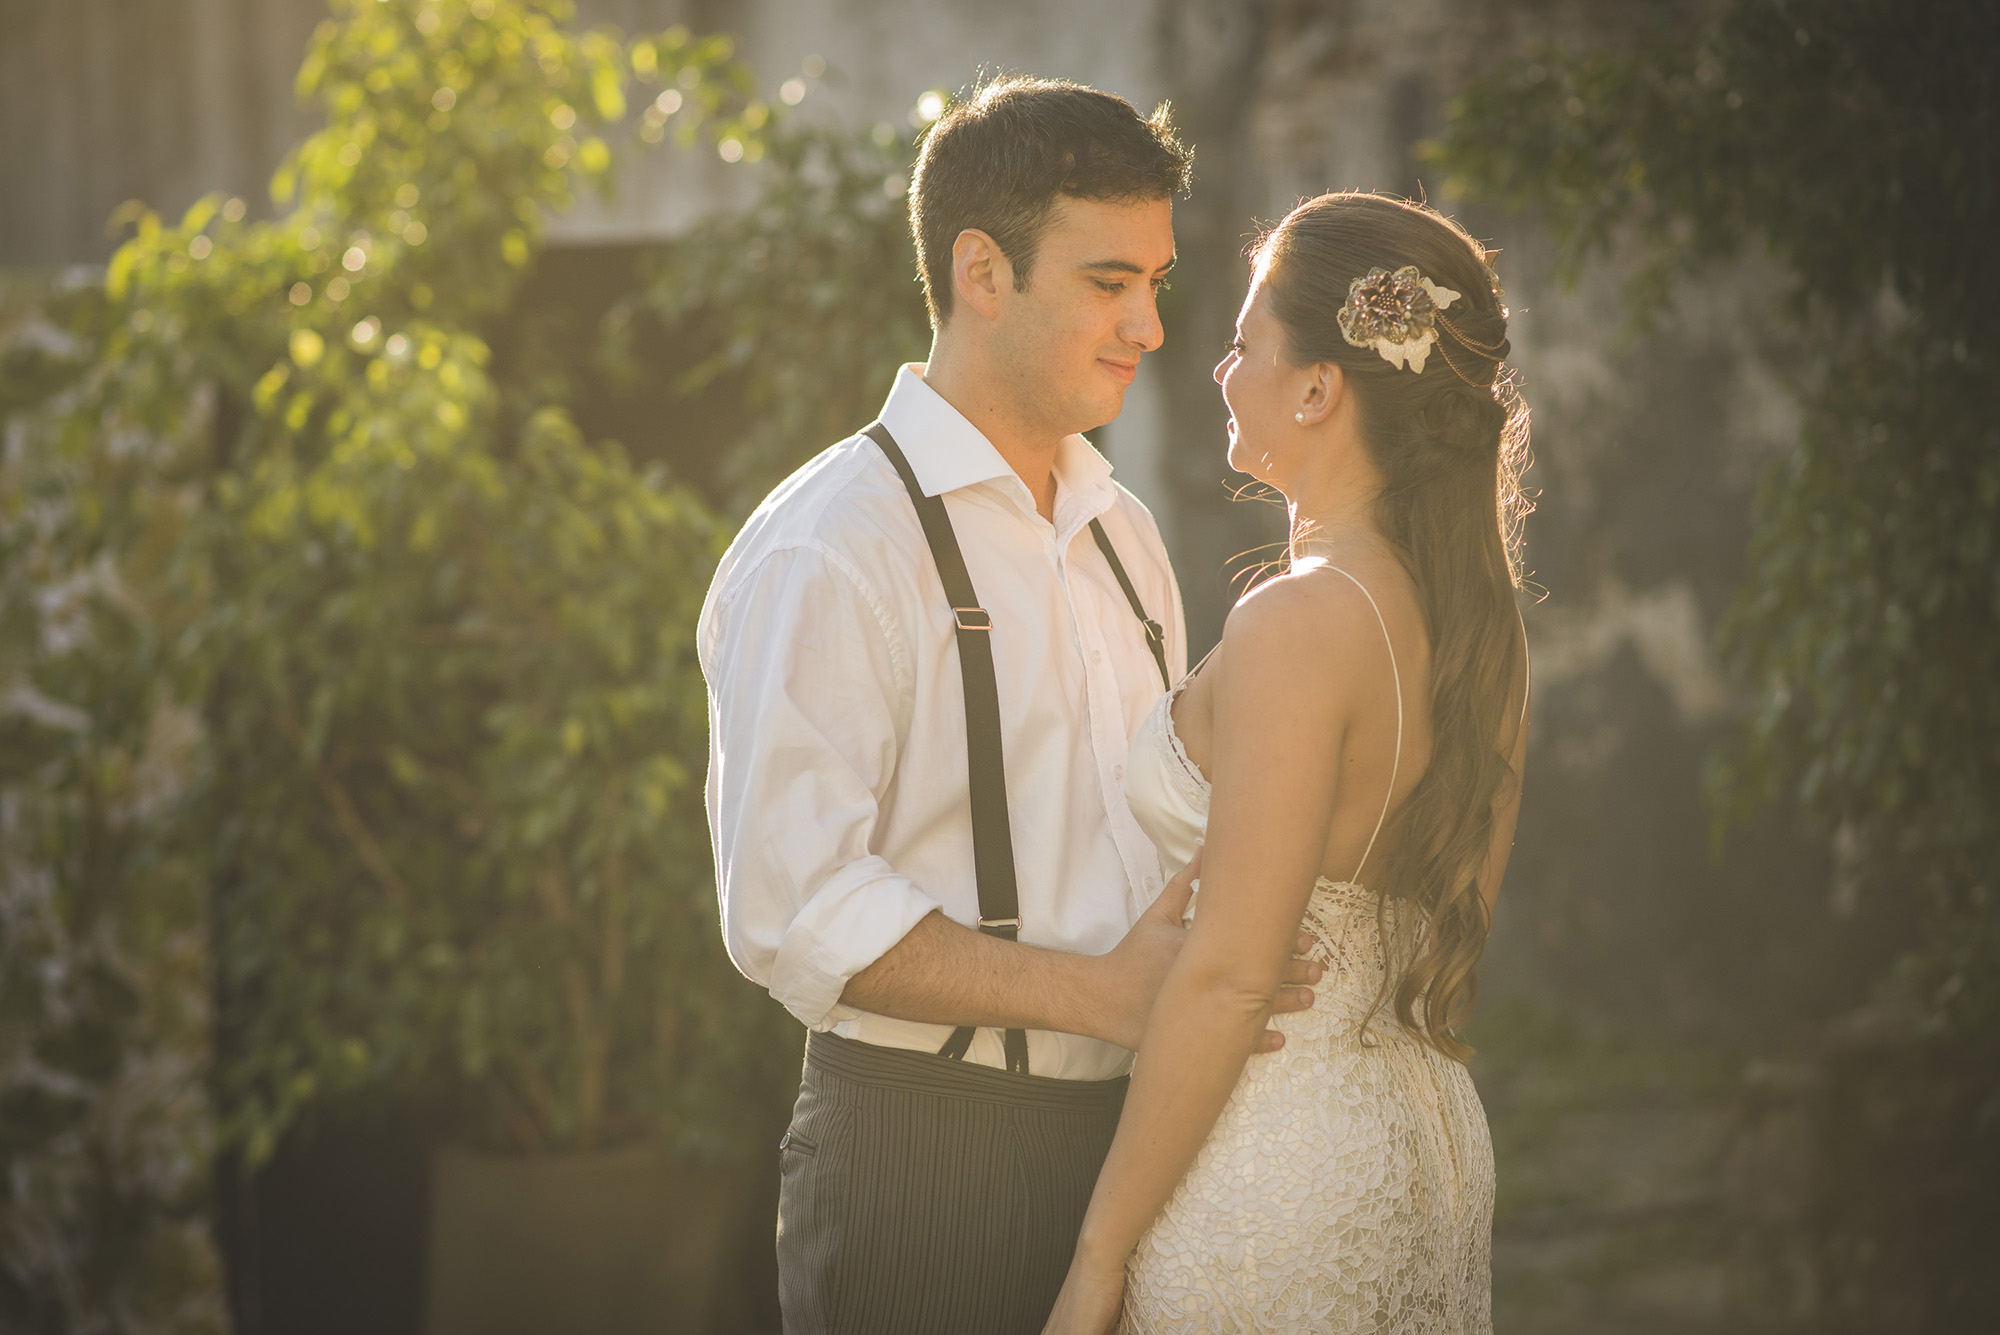 patricia-riba-casamiento-montevideo-uruguay-lindolfo-62